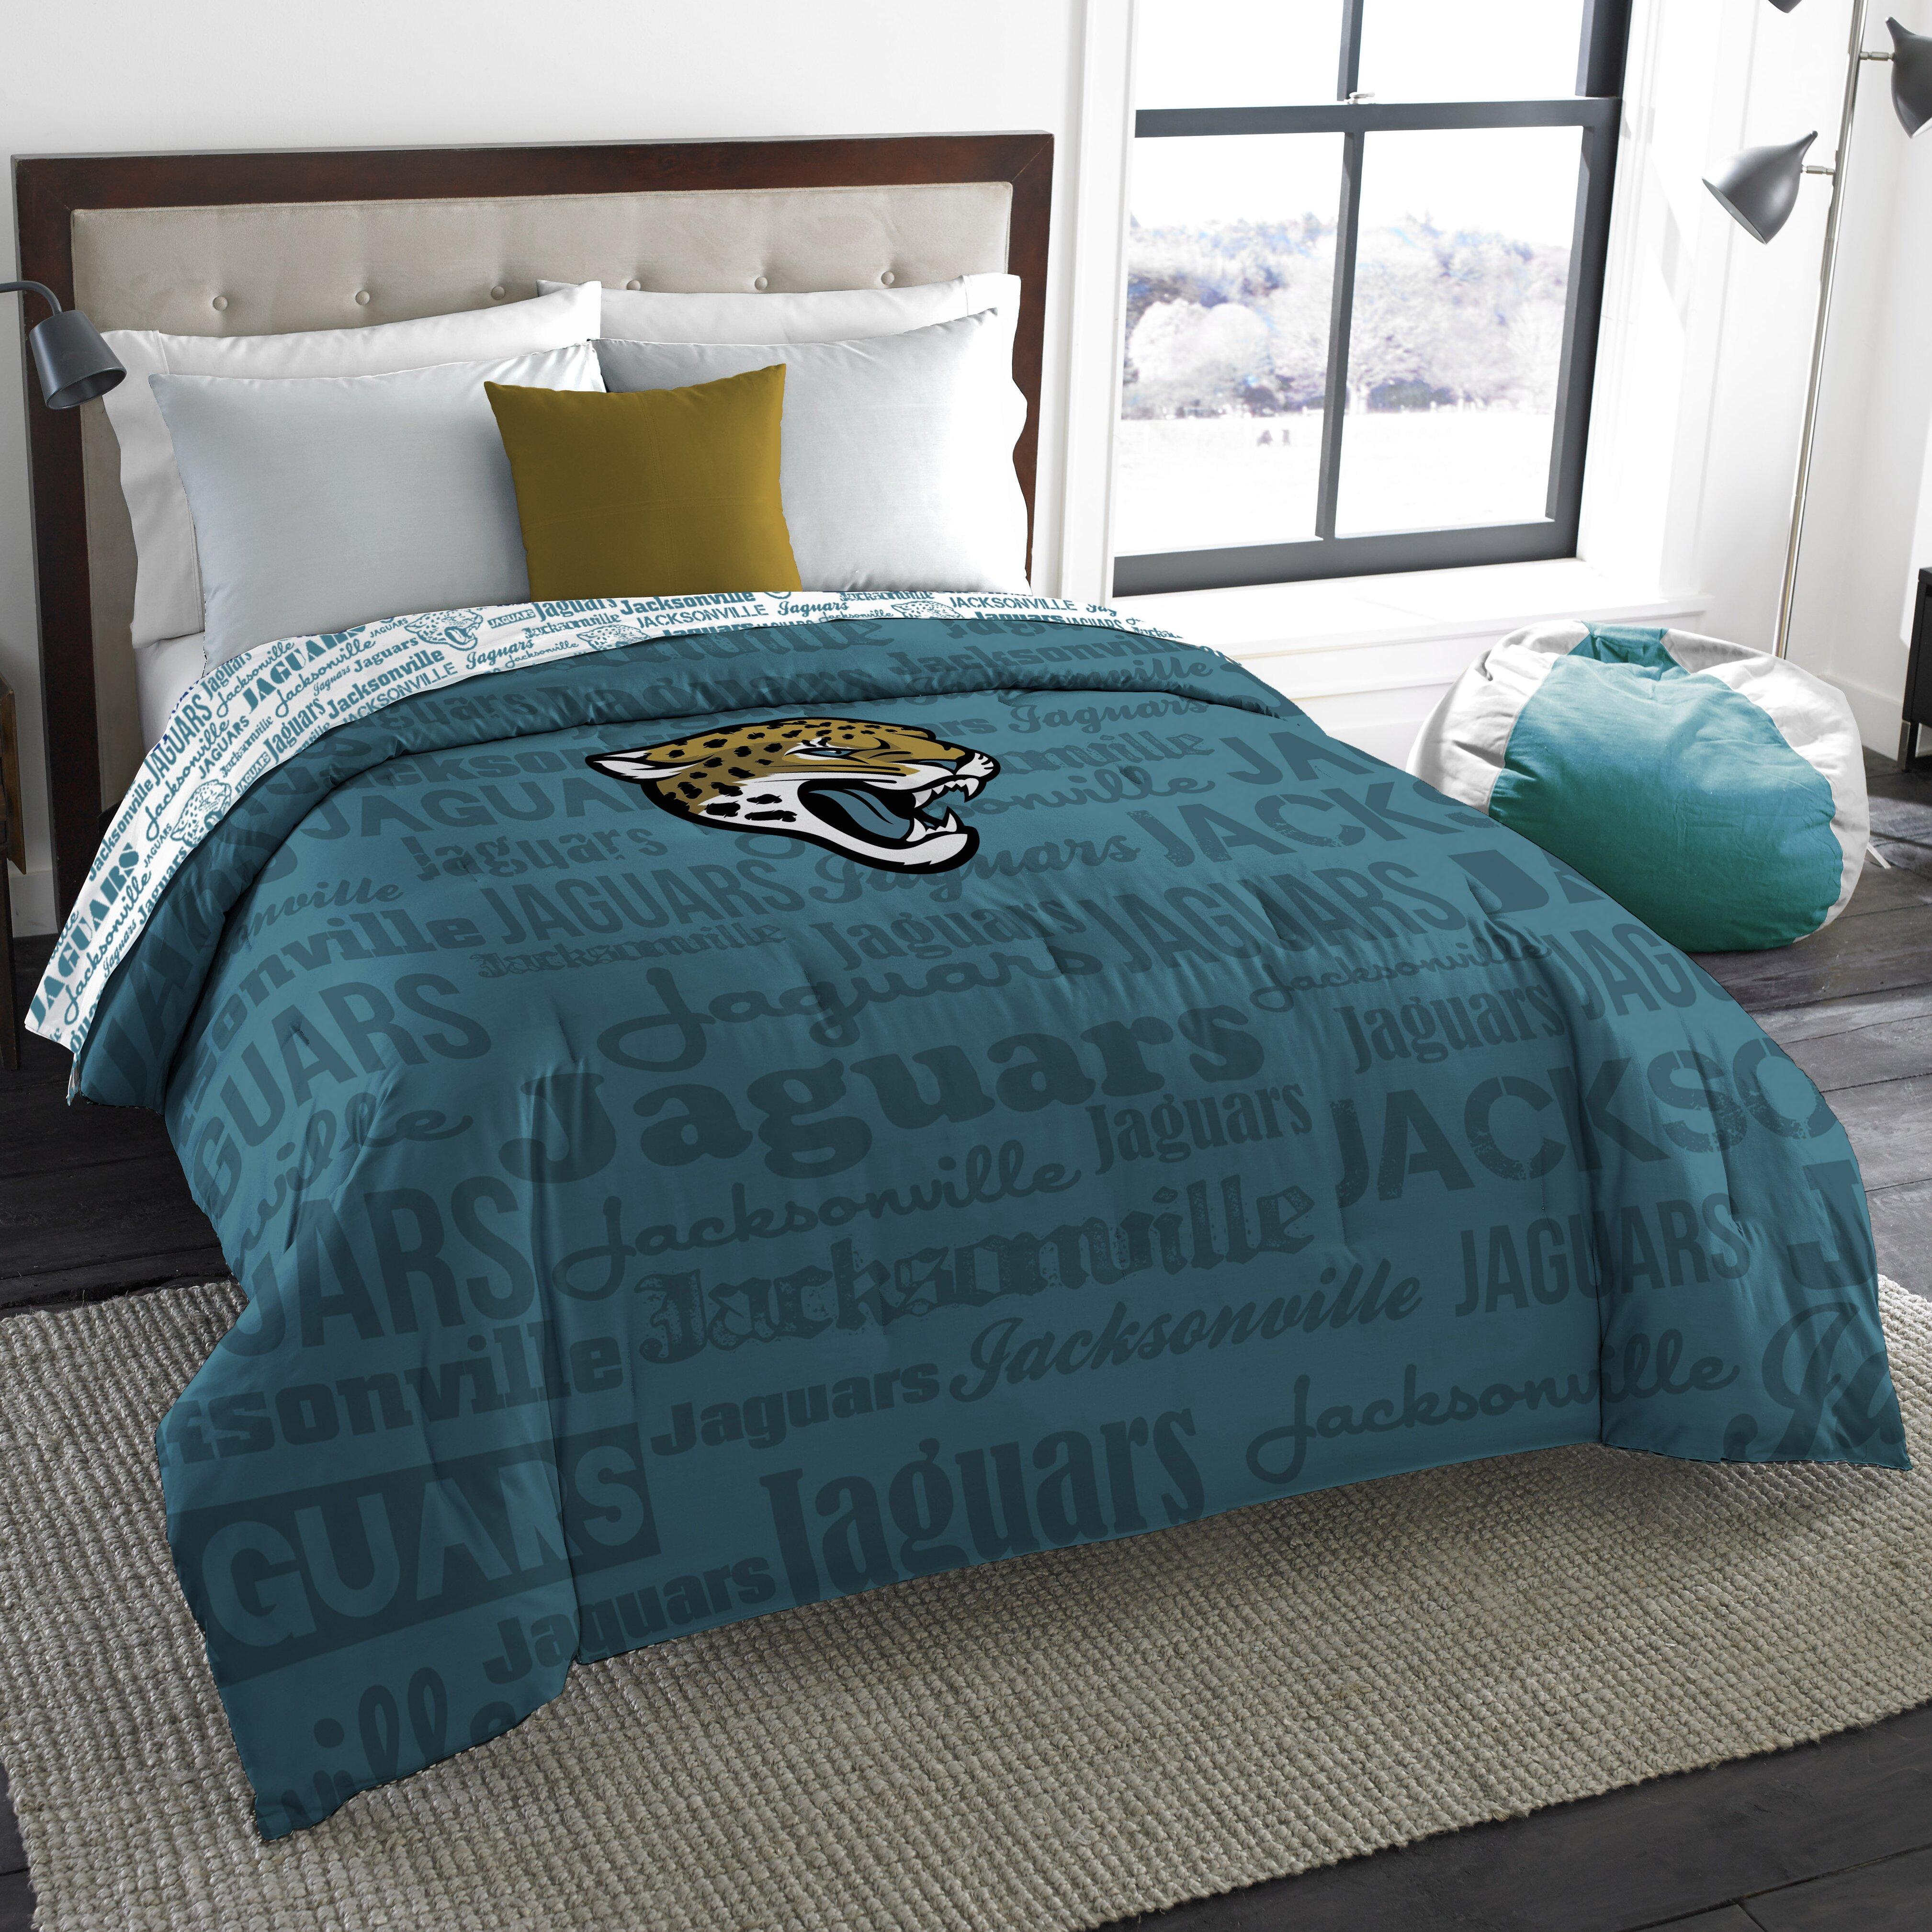 cotton marimekko pdp reversible bedding set bed reviews pieni allmodern comforter